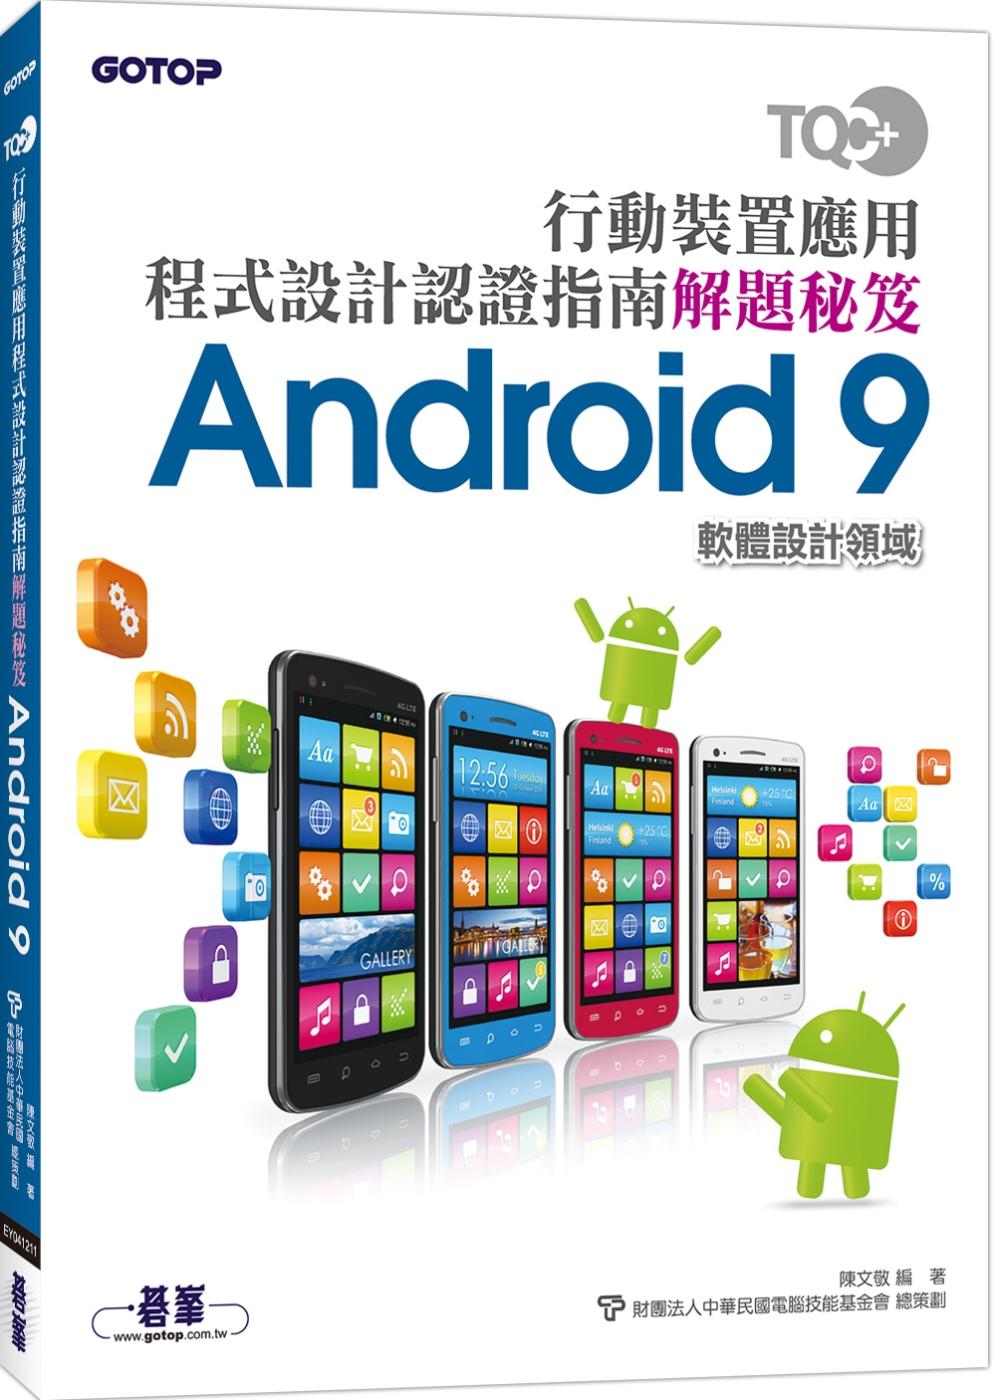 TQC+ 行動裝置應用程式設計認證指南解題秘笈:Android 9